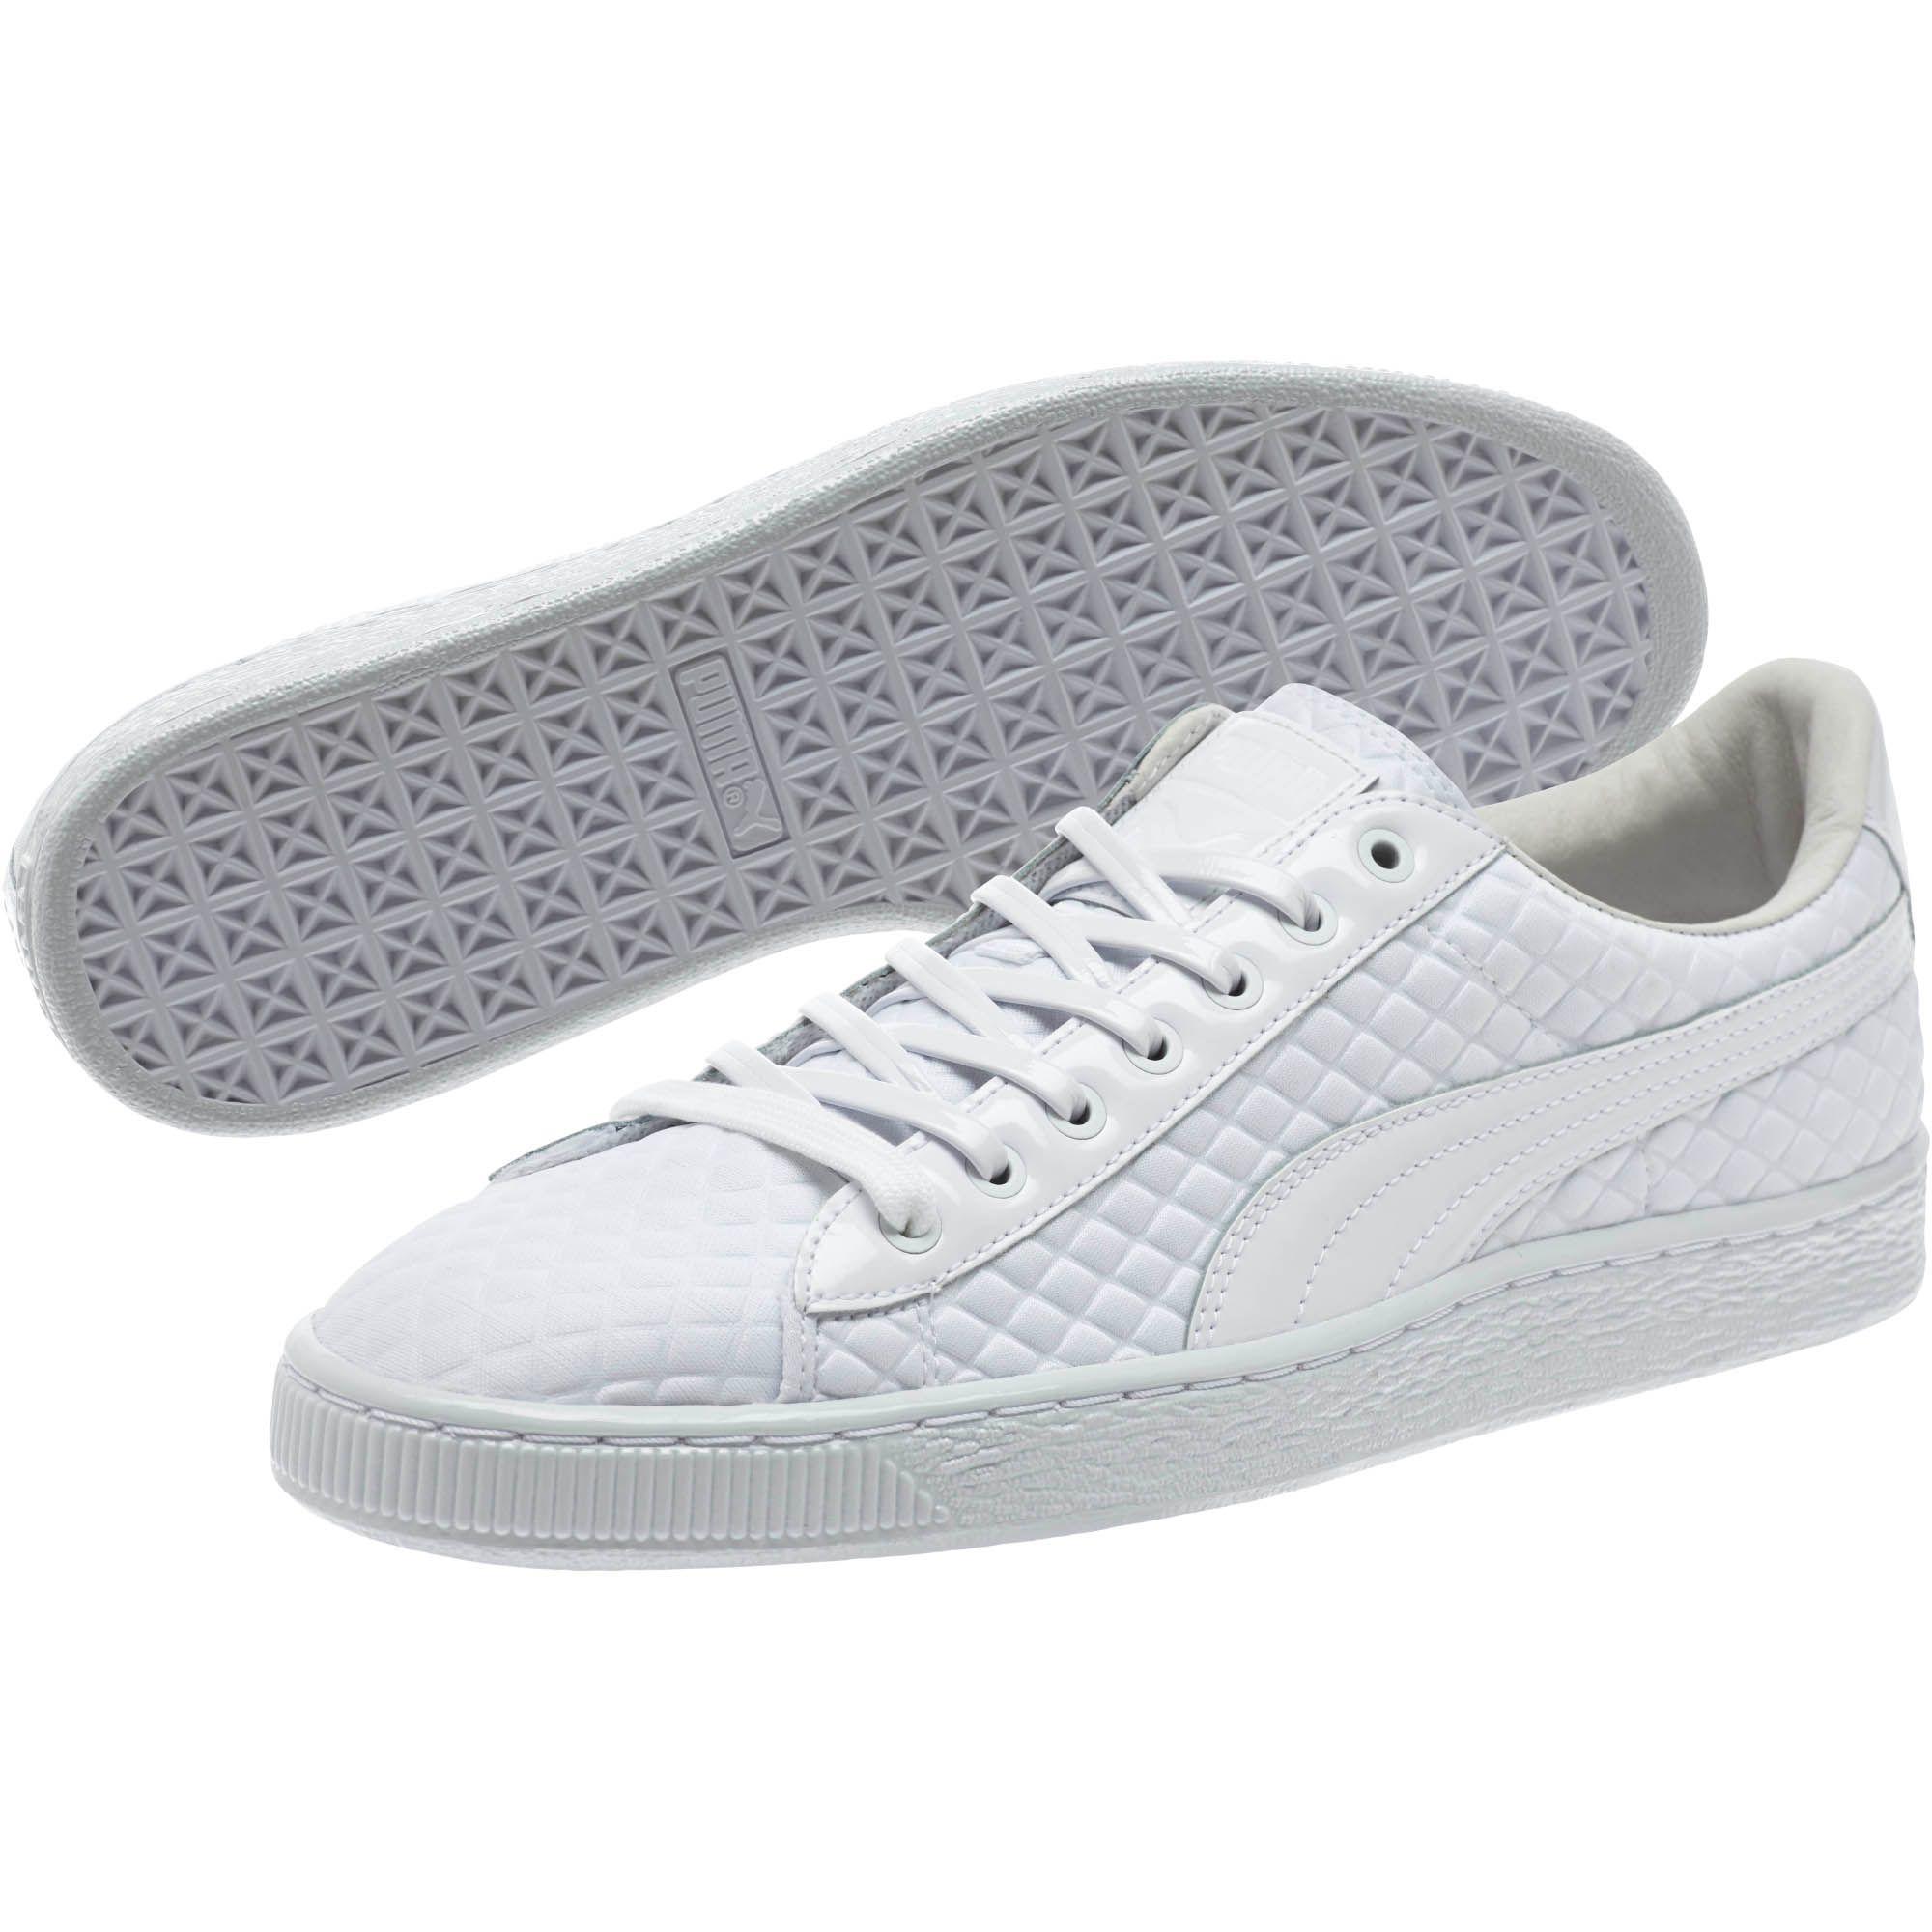 93e08a46624 Lyst - PUMA Meek Mill Dreamchasers Basket Men s Sneakers in Brown ...